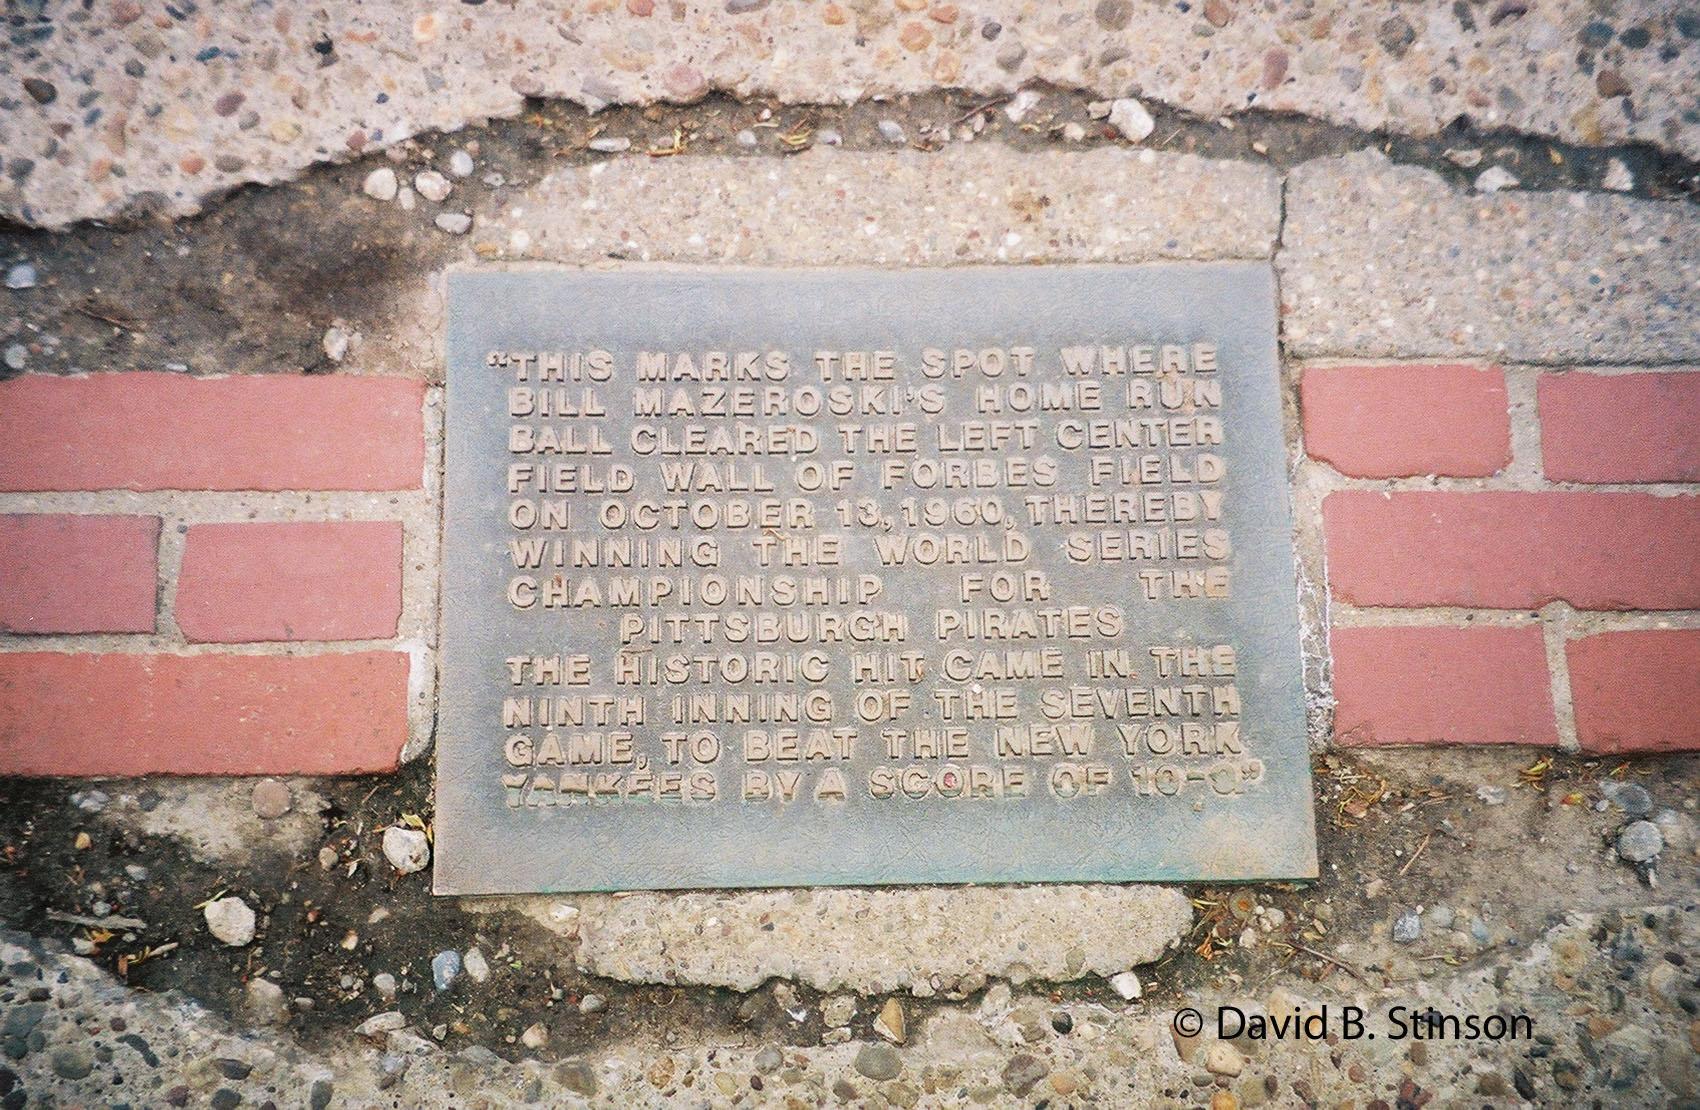 Plaque honoring the spot where Bill Mazeroski hit the 1960 World Series winning home run